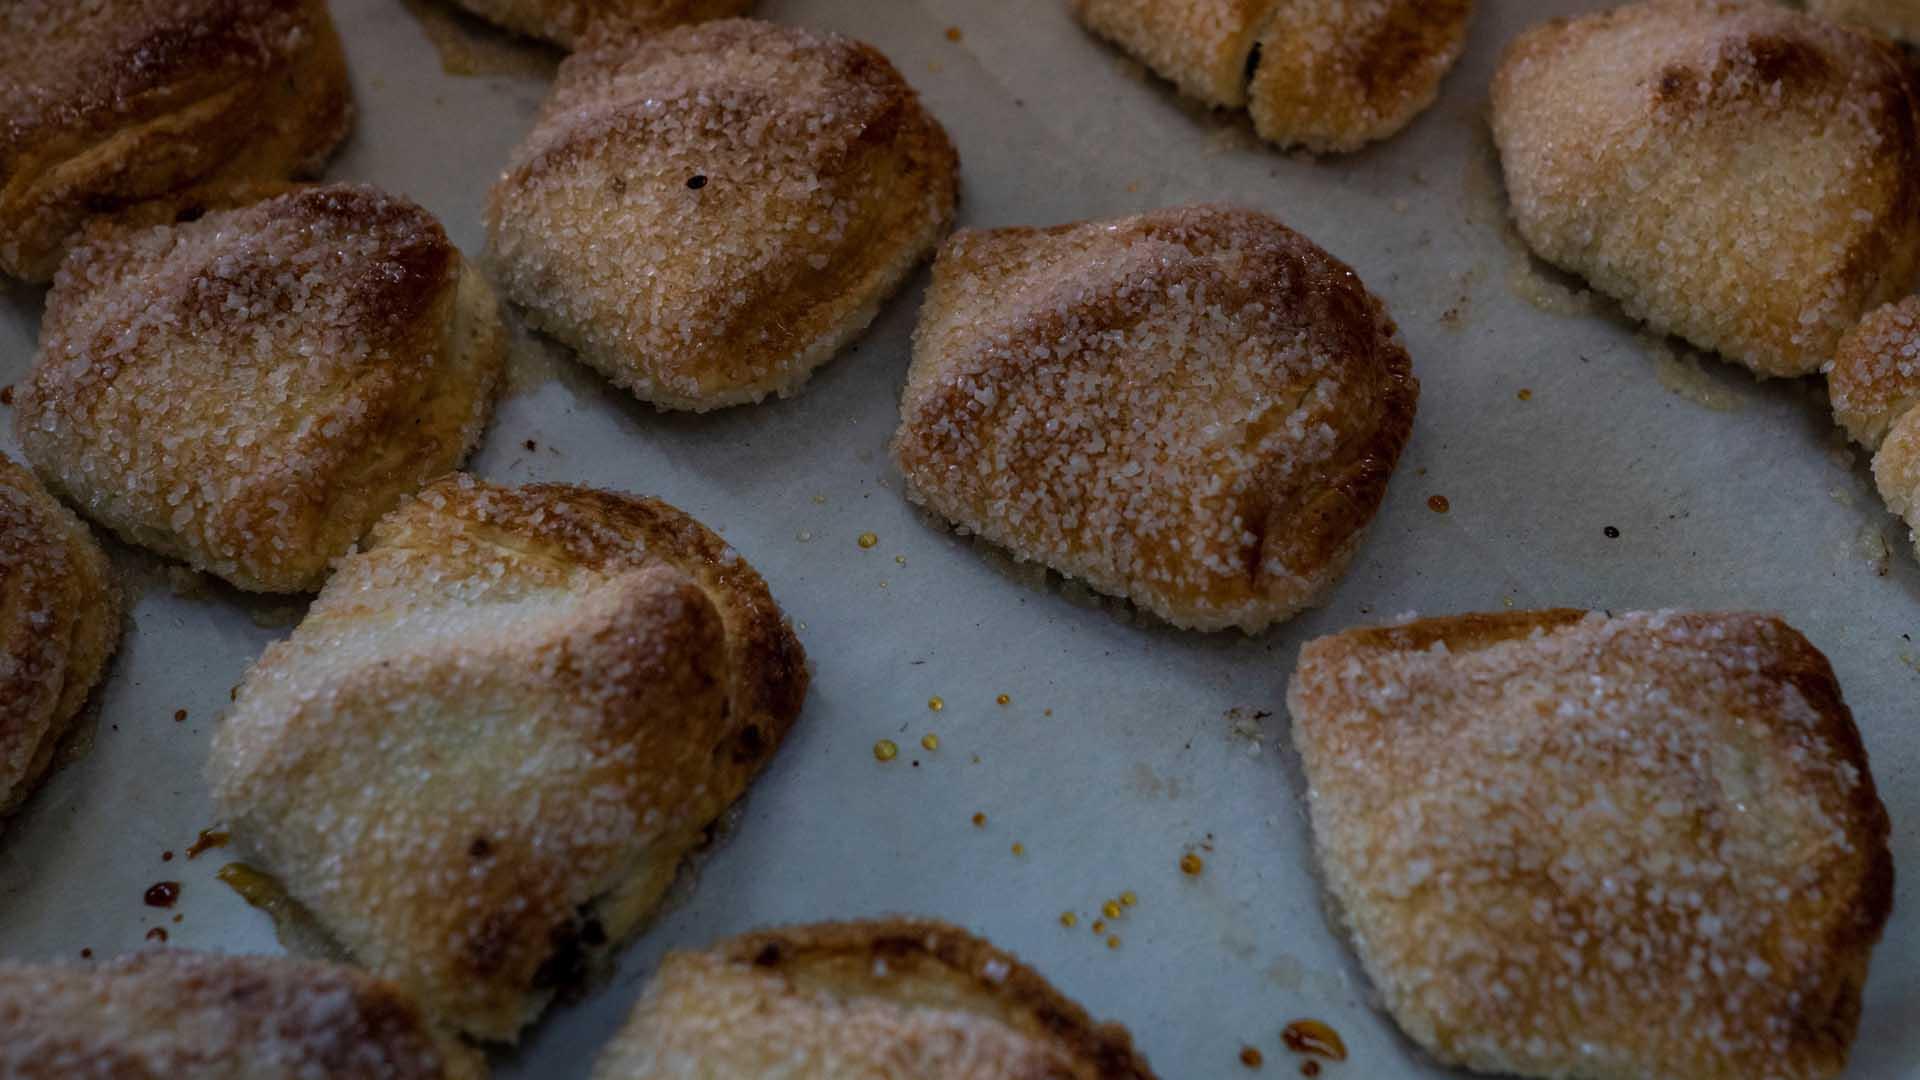 Jam Filled Pastries XXII